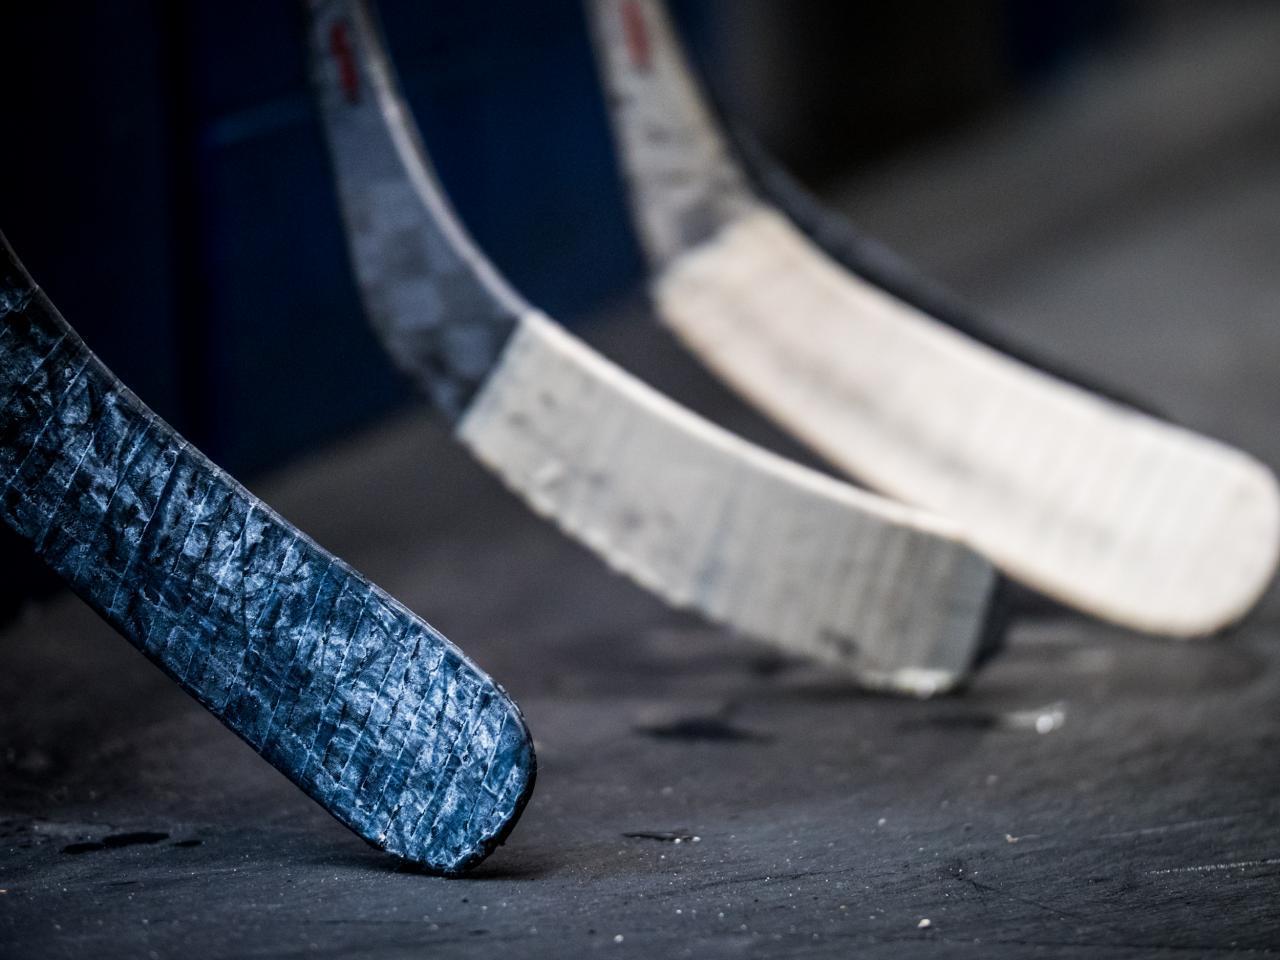 Ice-Hockey-the-ubyssey-Saman-Shariati-15.jpg